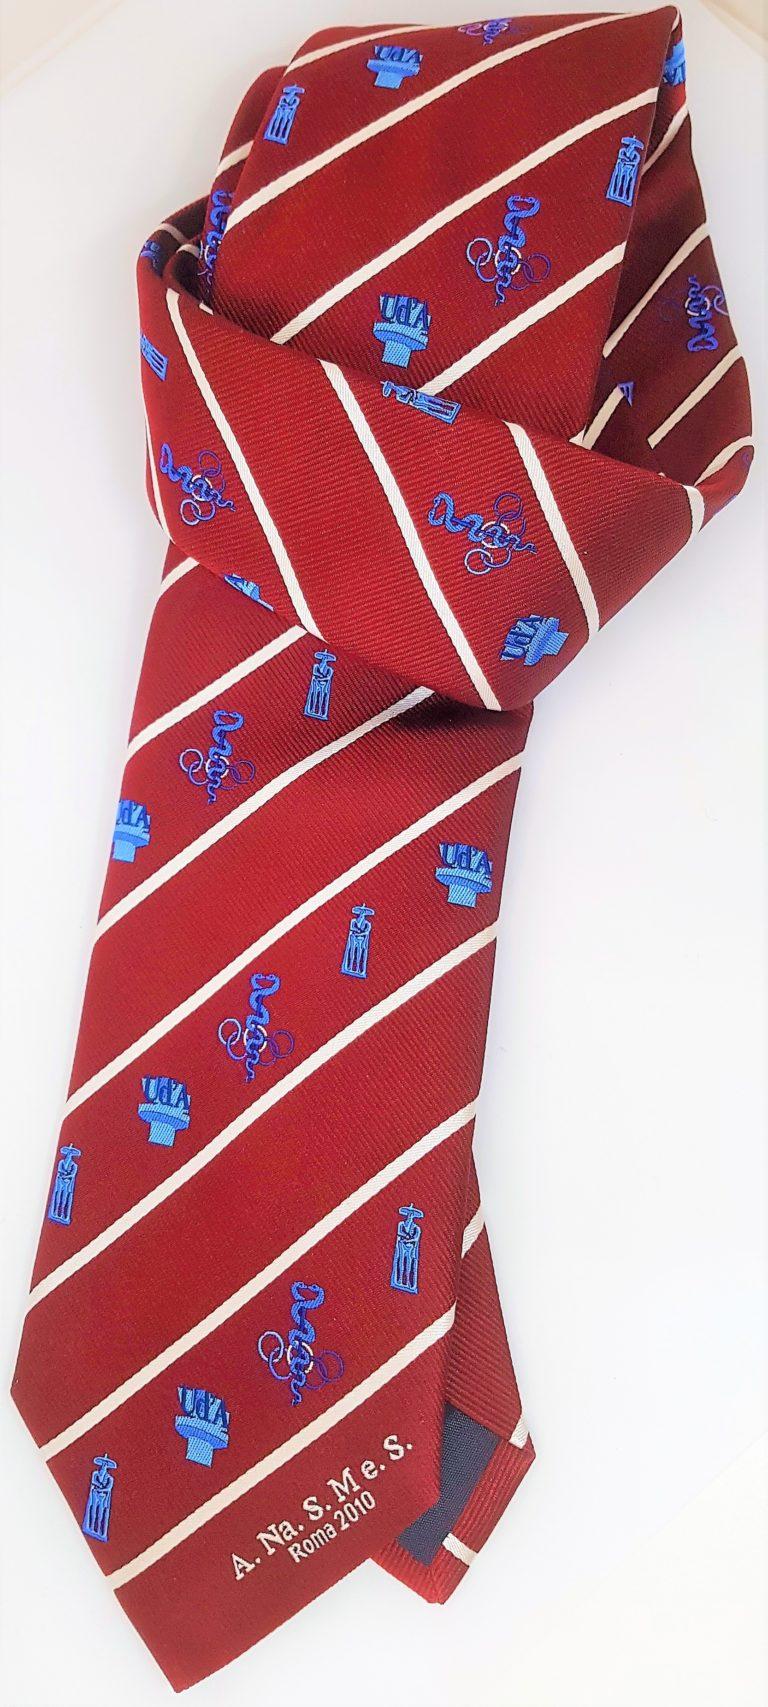 Cravatta seta bordeaux con loghi